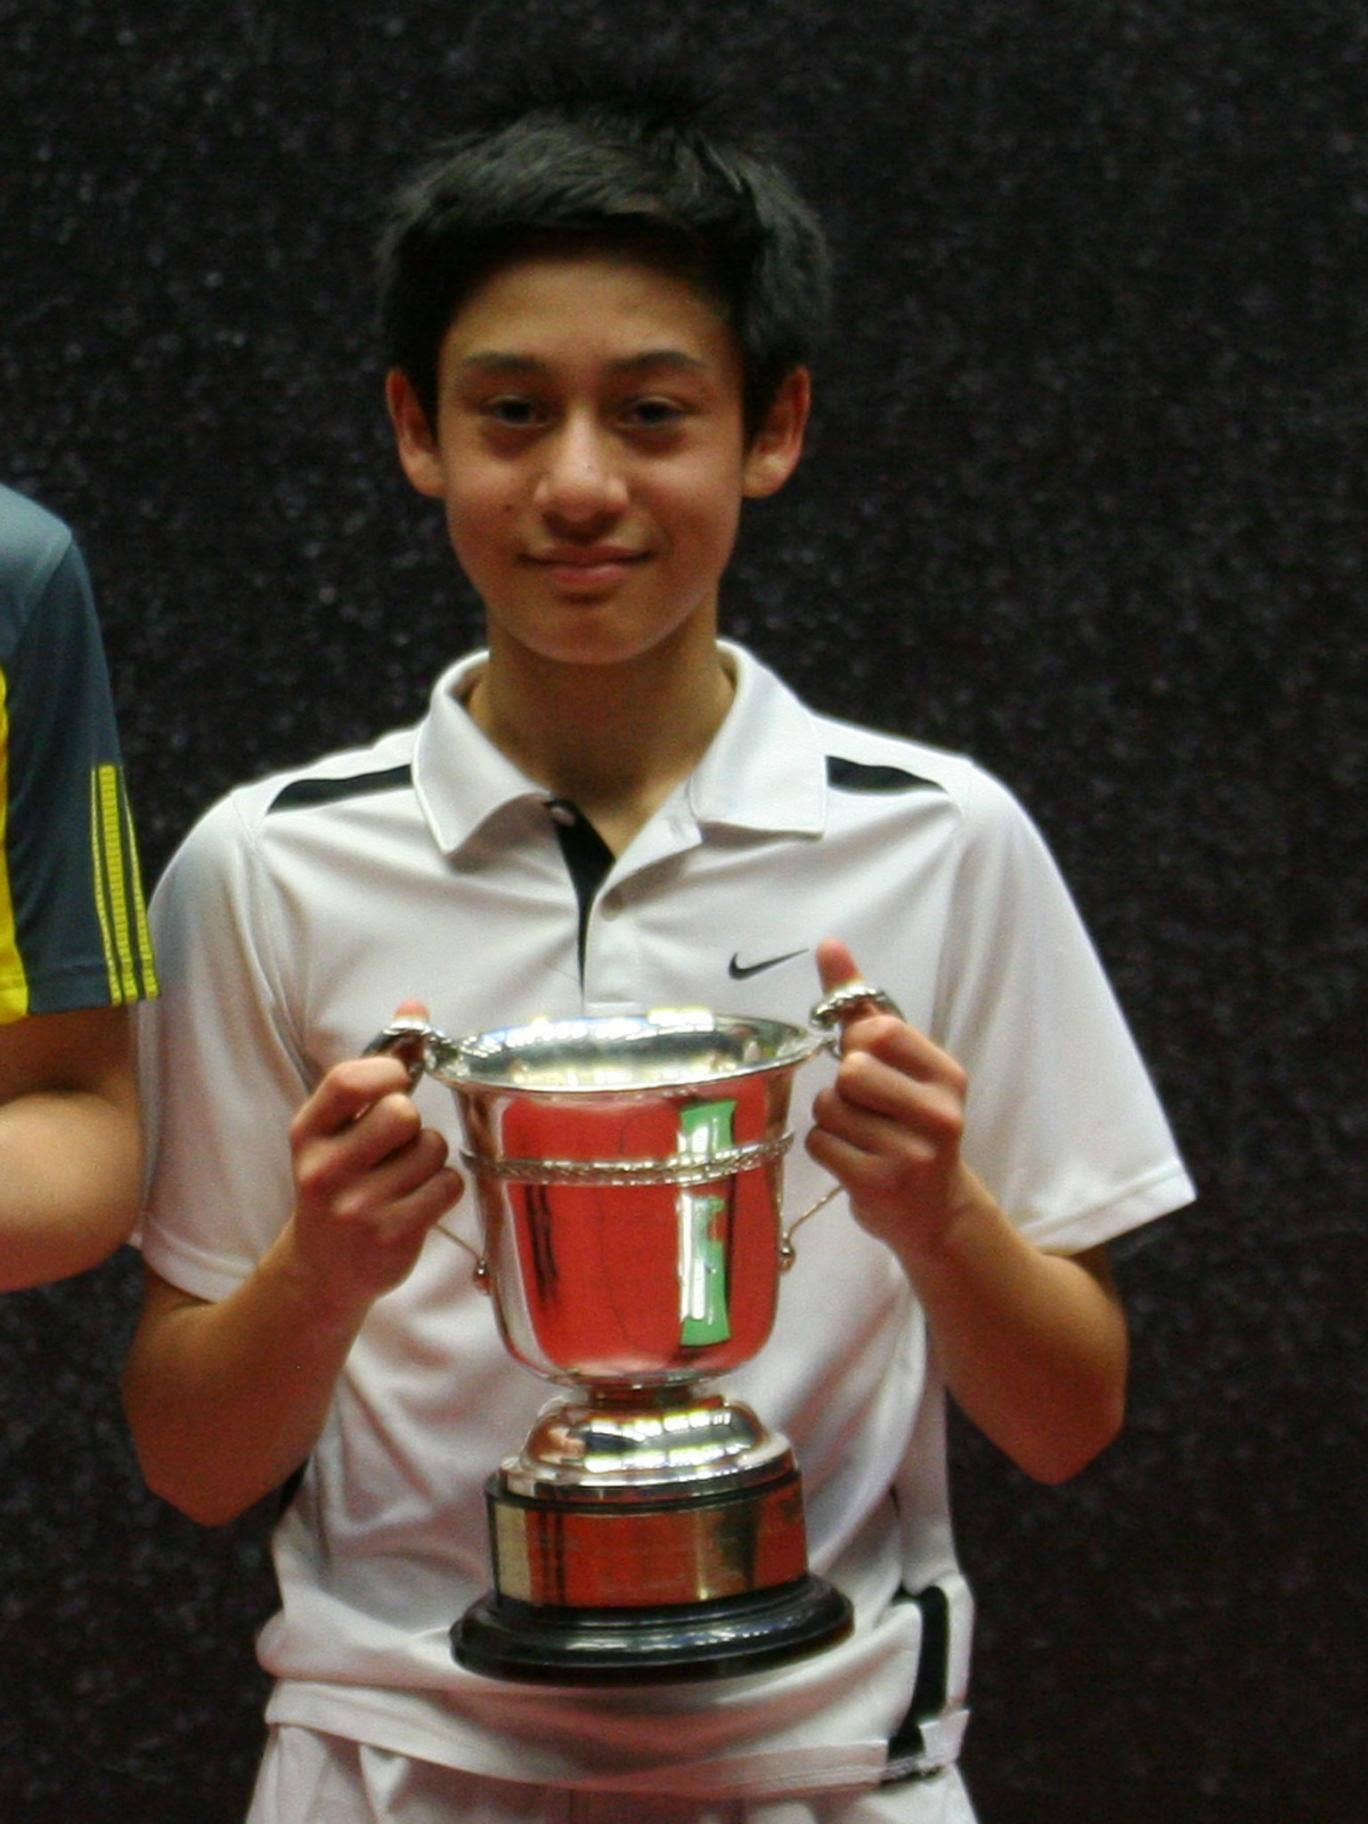 Ben Cawston, 14, holds his national Public Schools trophy